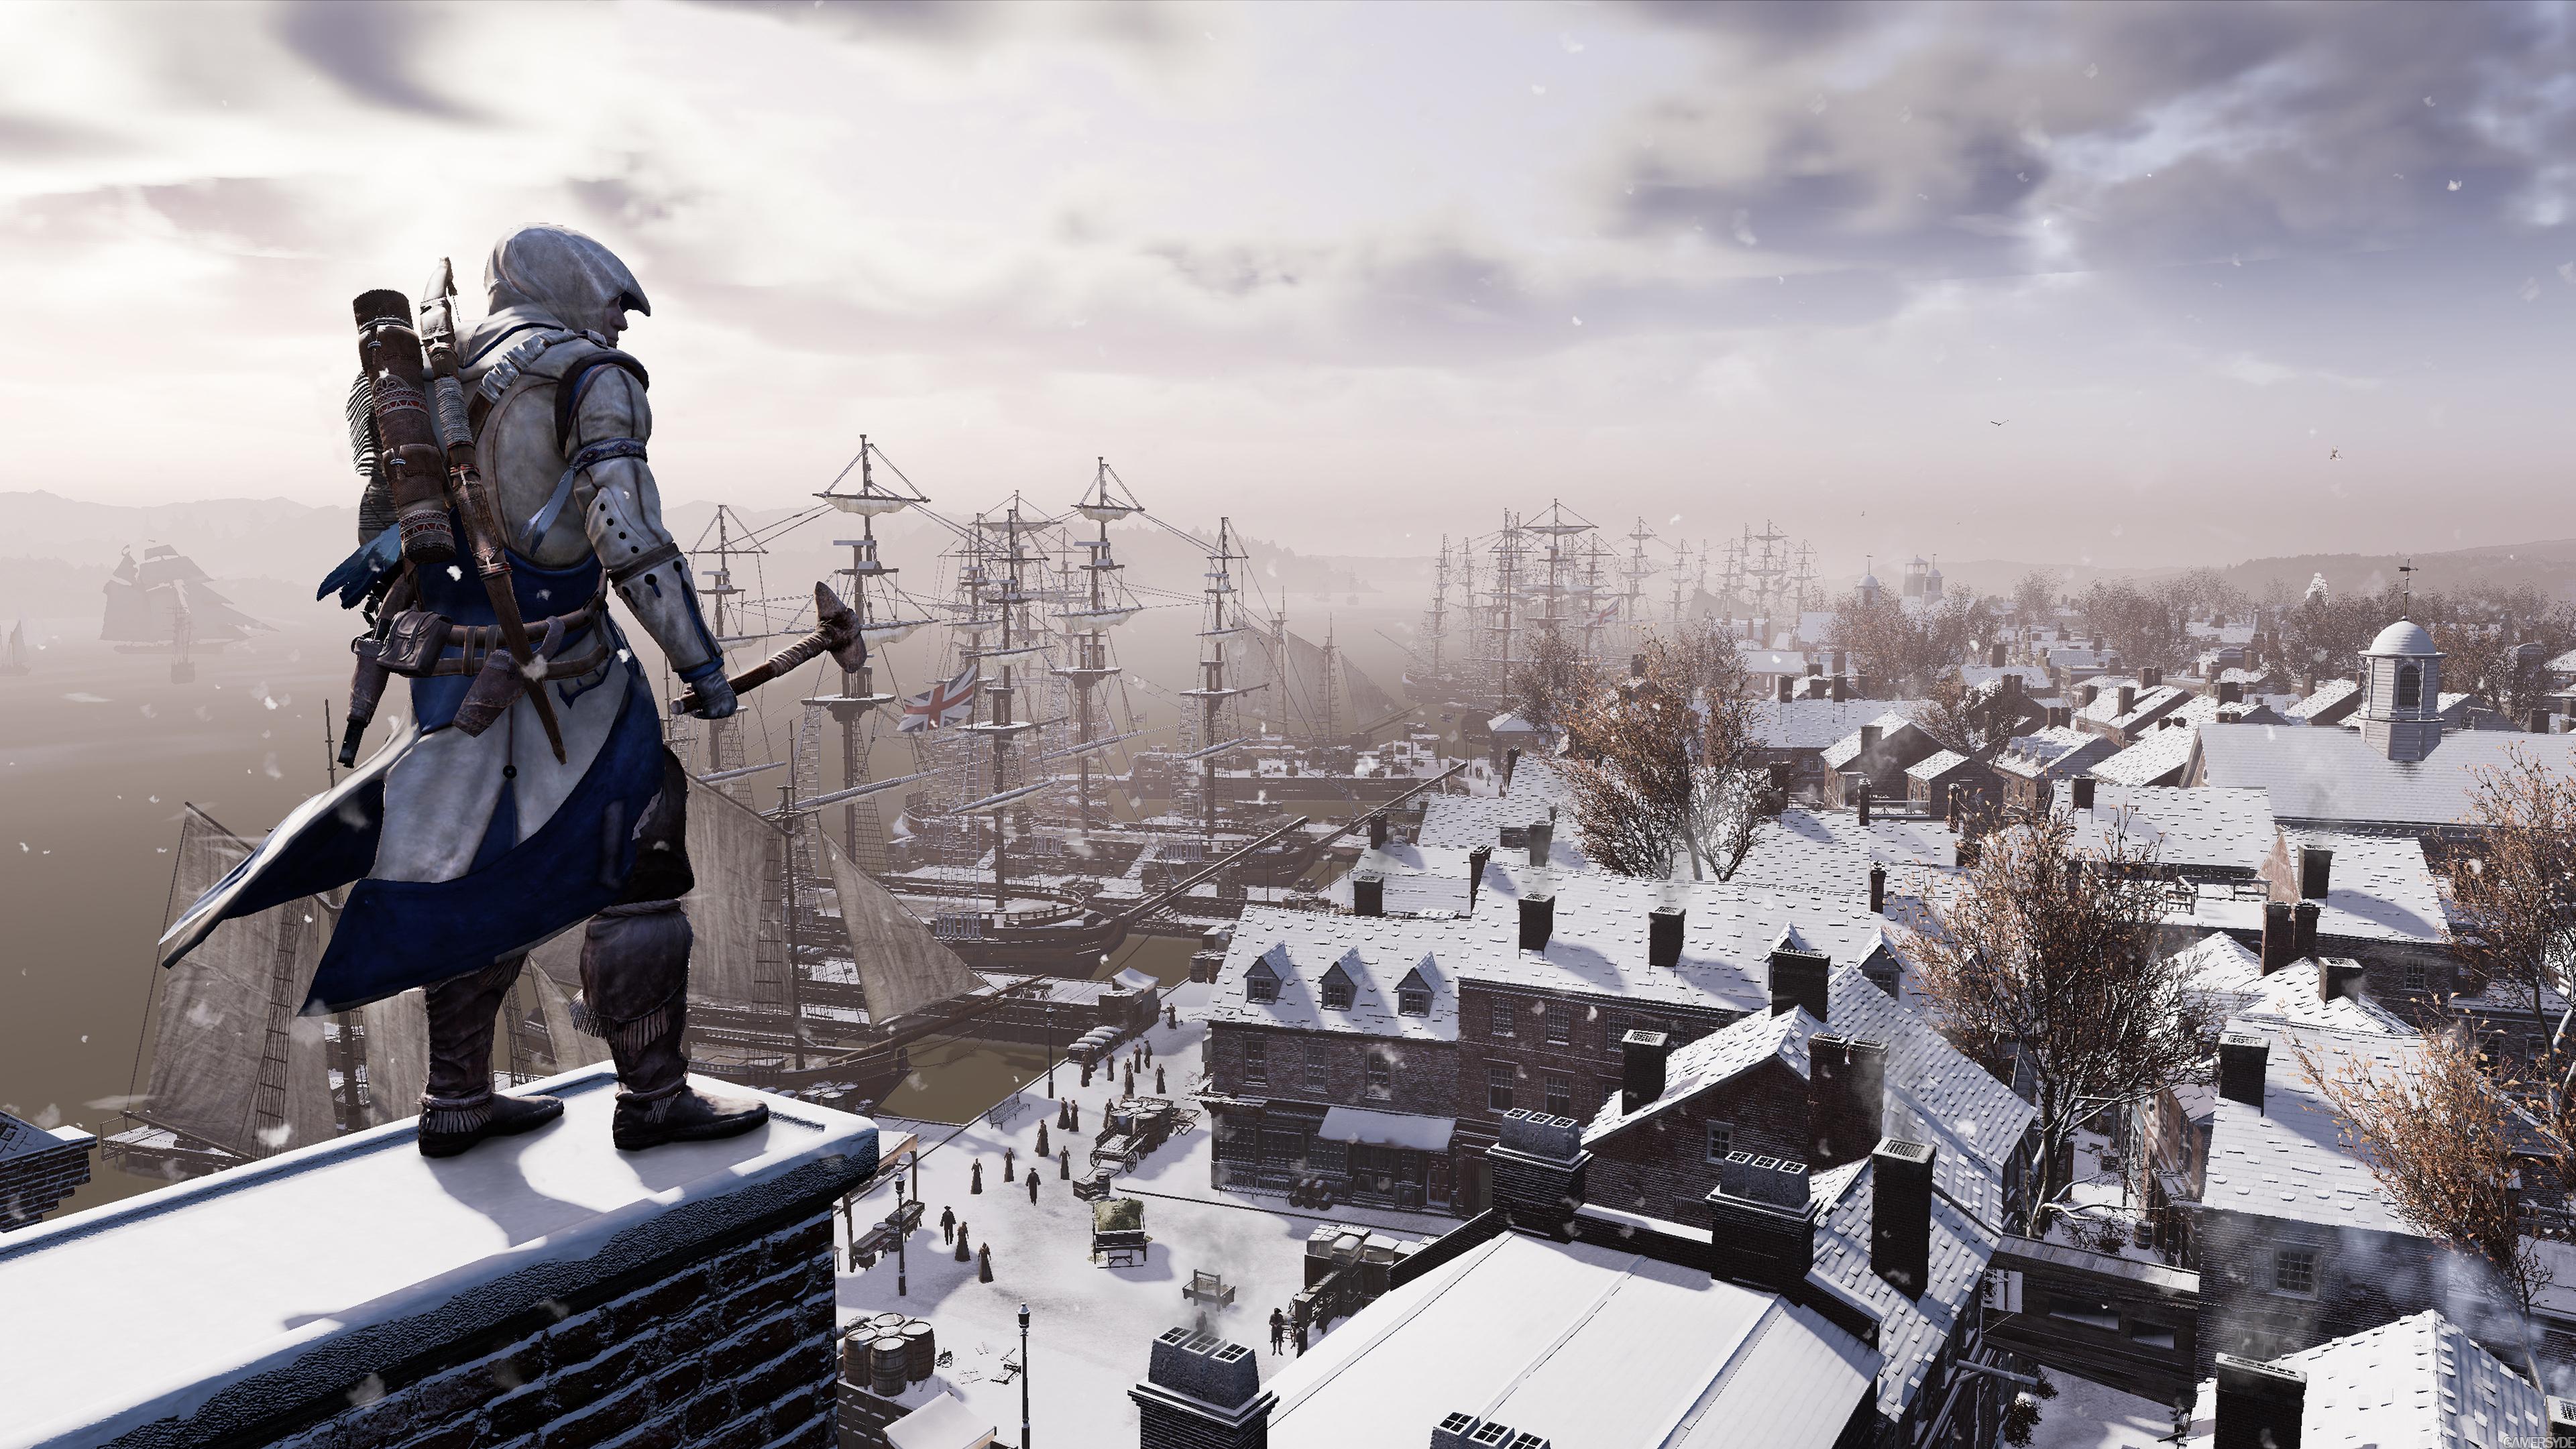 Assassins Creed Remastered Wallpaper Hd Games 4k